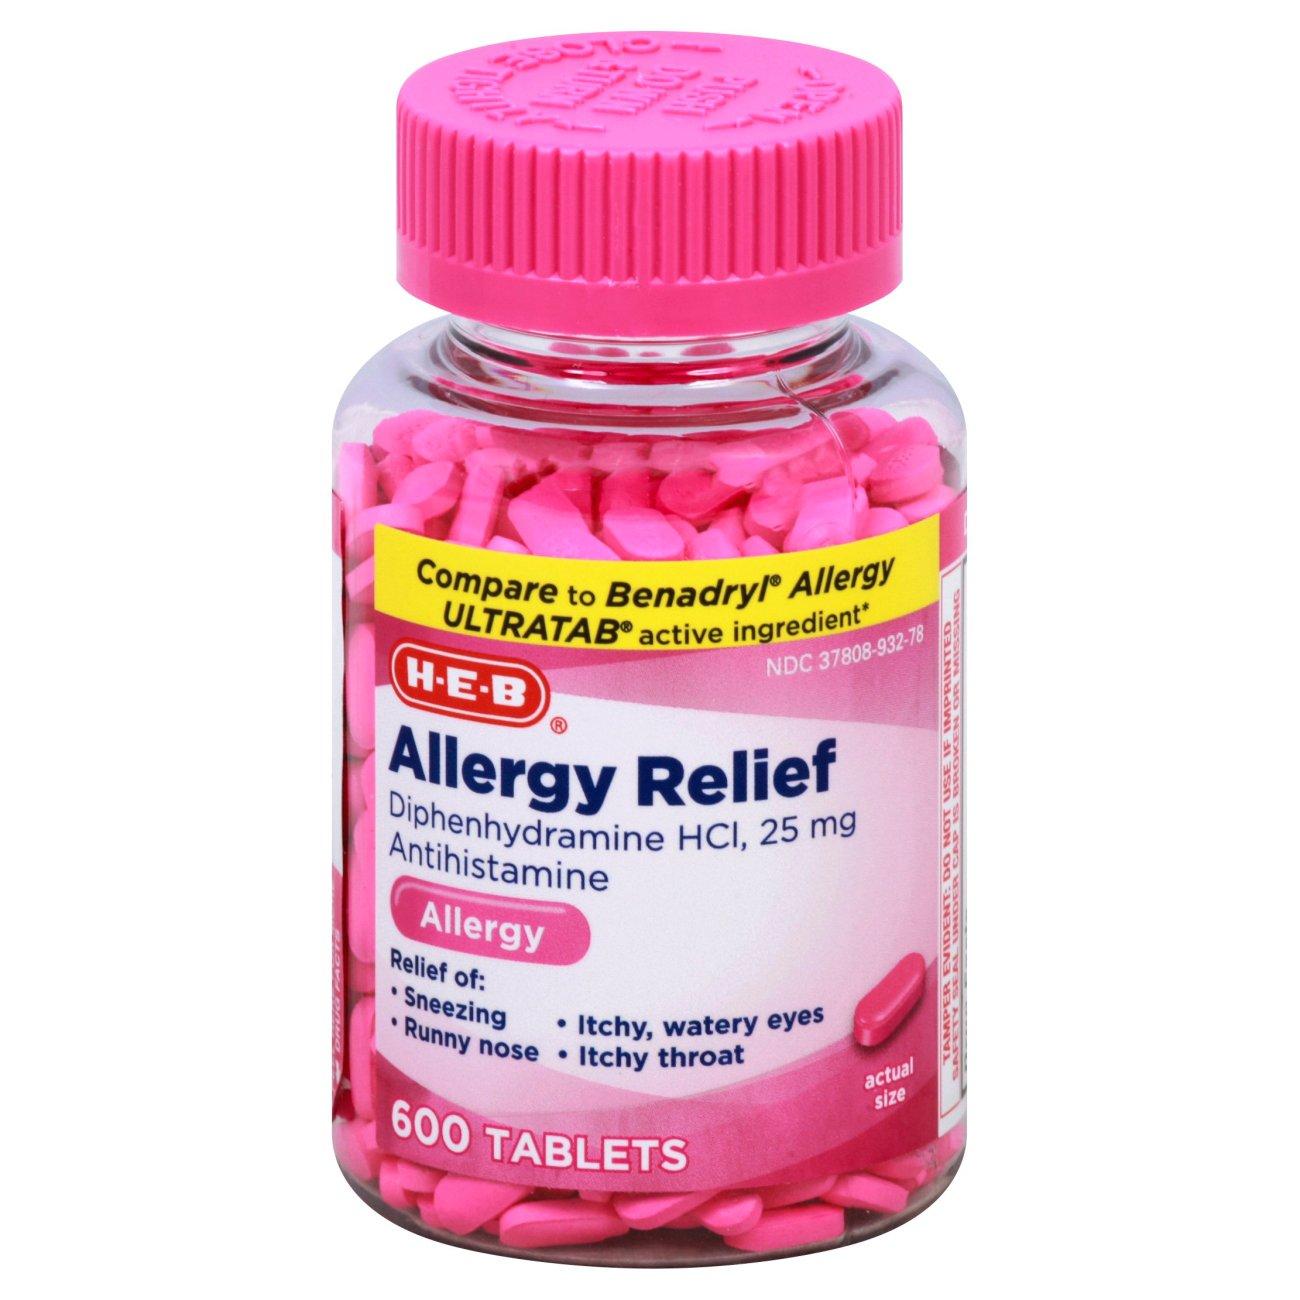 H‑E‑B Allergy Relief Antihistamine 25 mg Tablets ‑ Shop Sinus & Allergy at  H‑E‑B